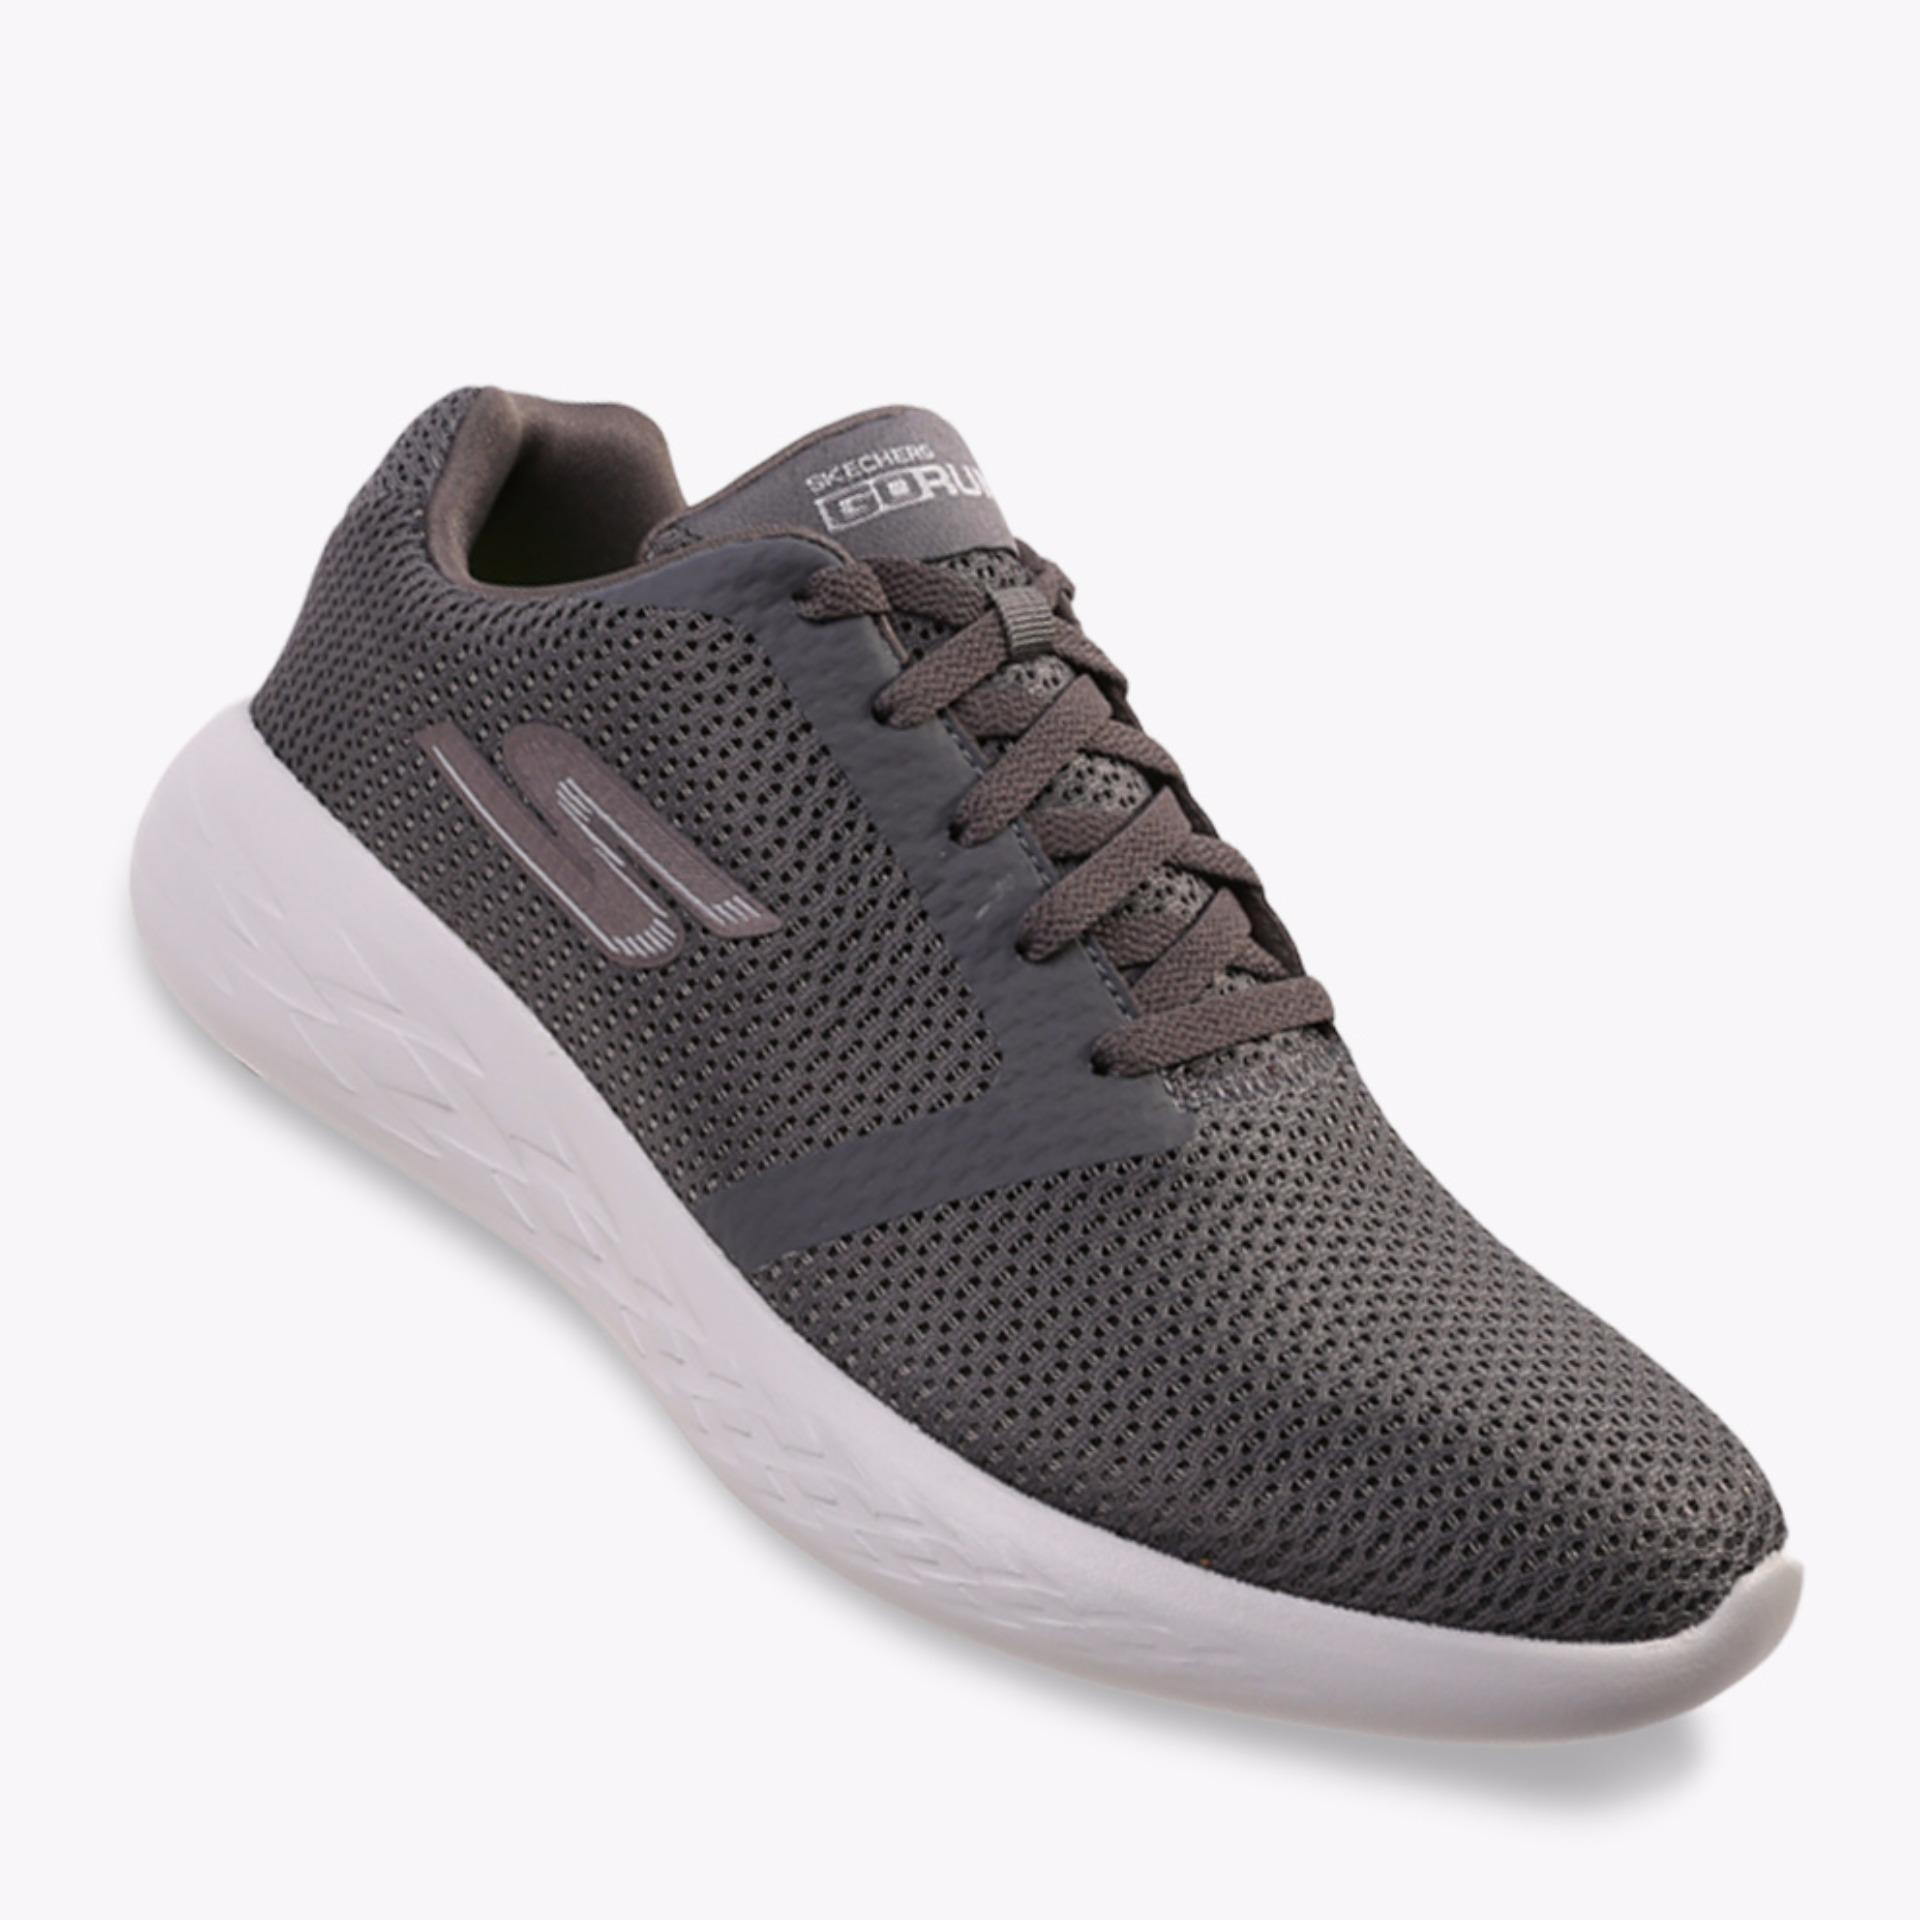 Harga Skechers Gorun 600 Refine Men S Running Shoes Abu Abu Online